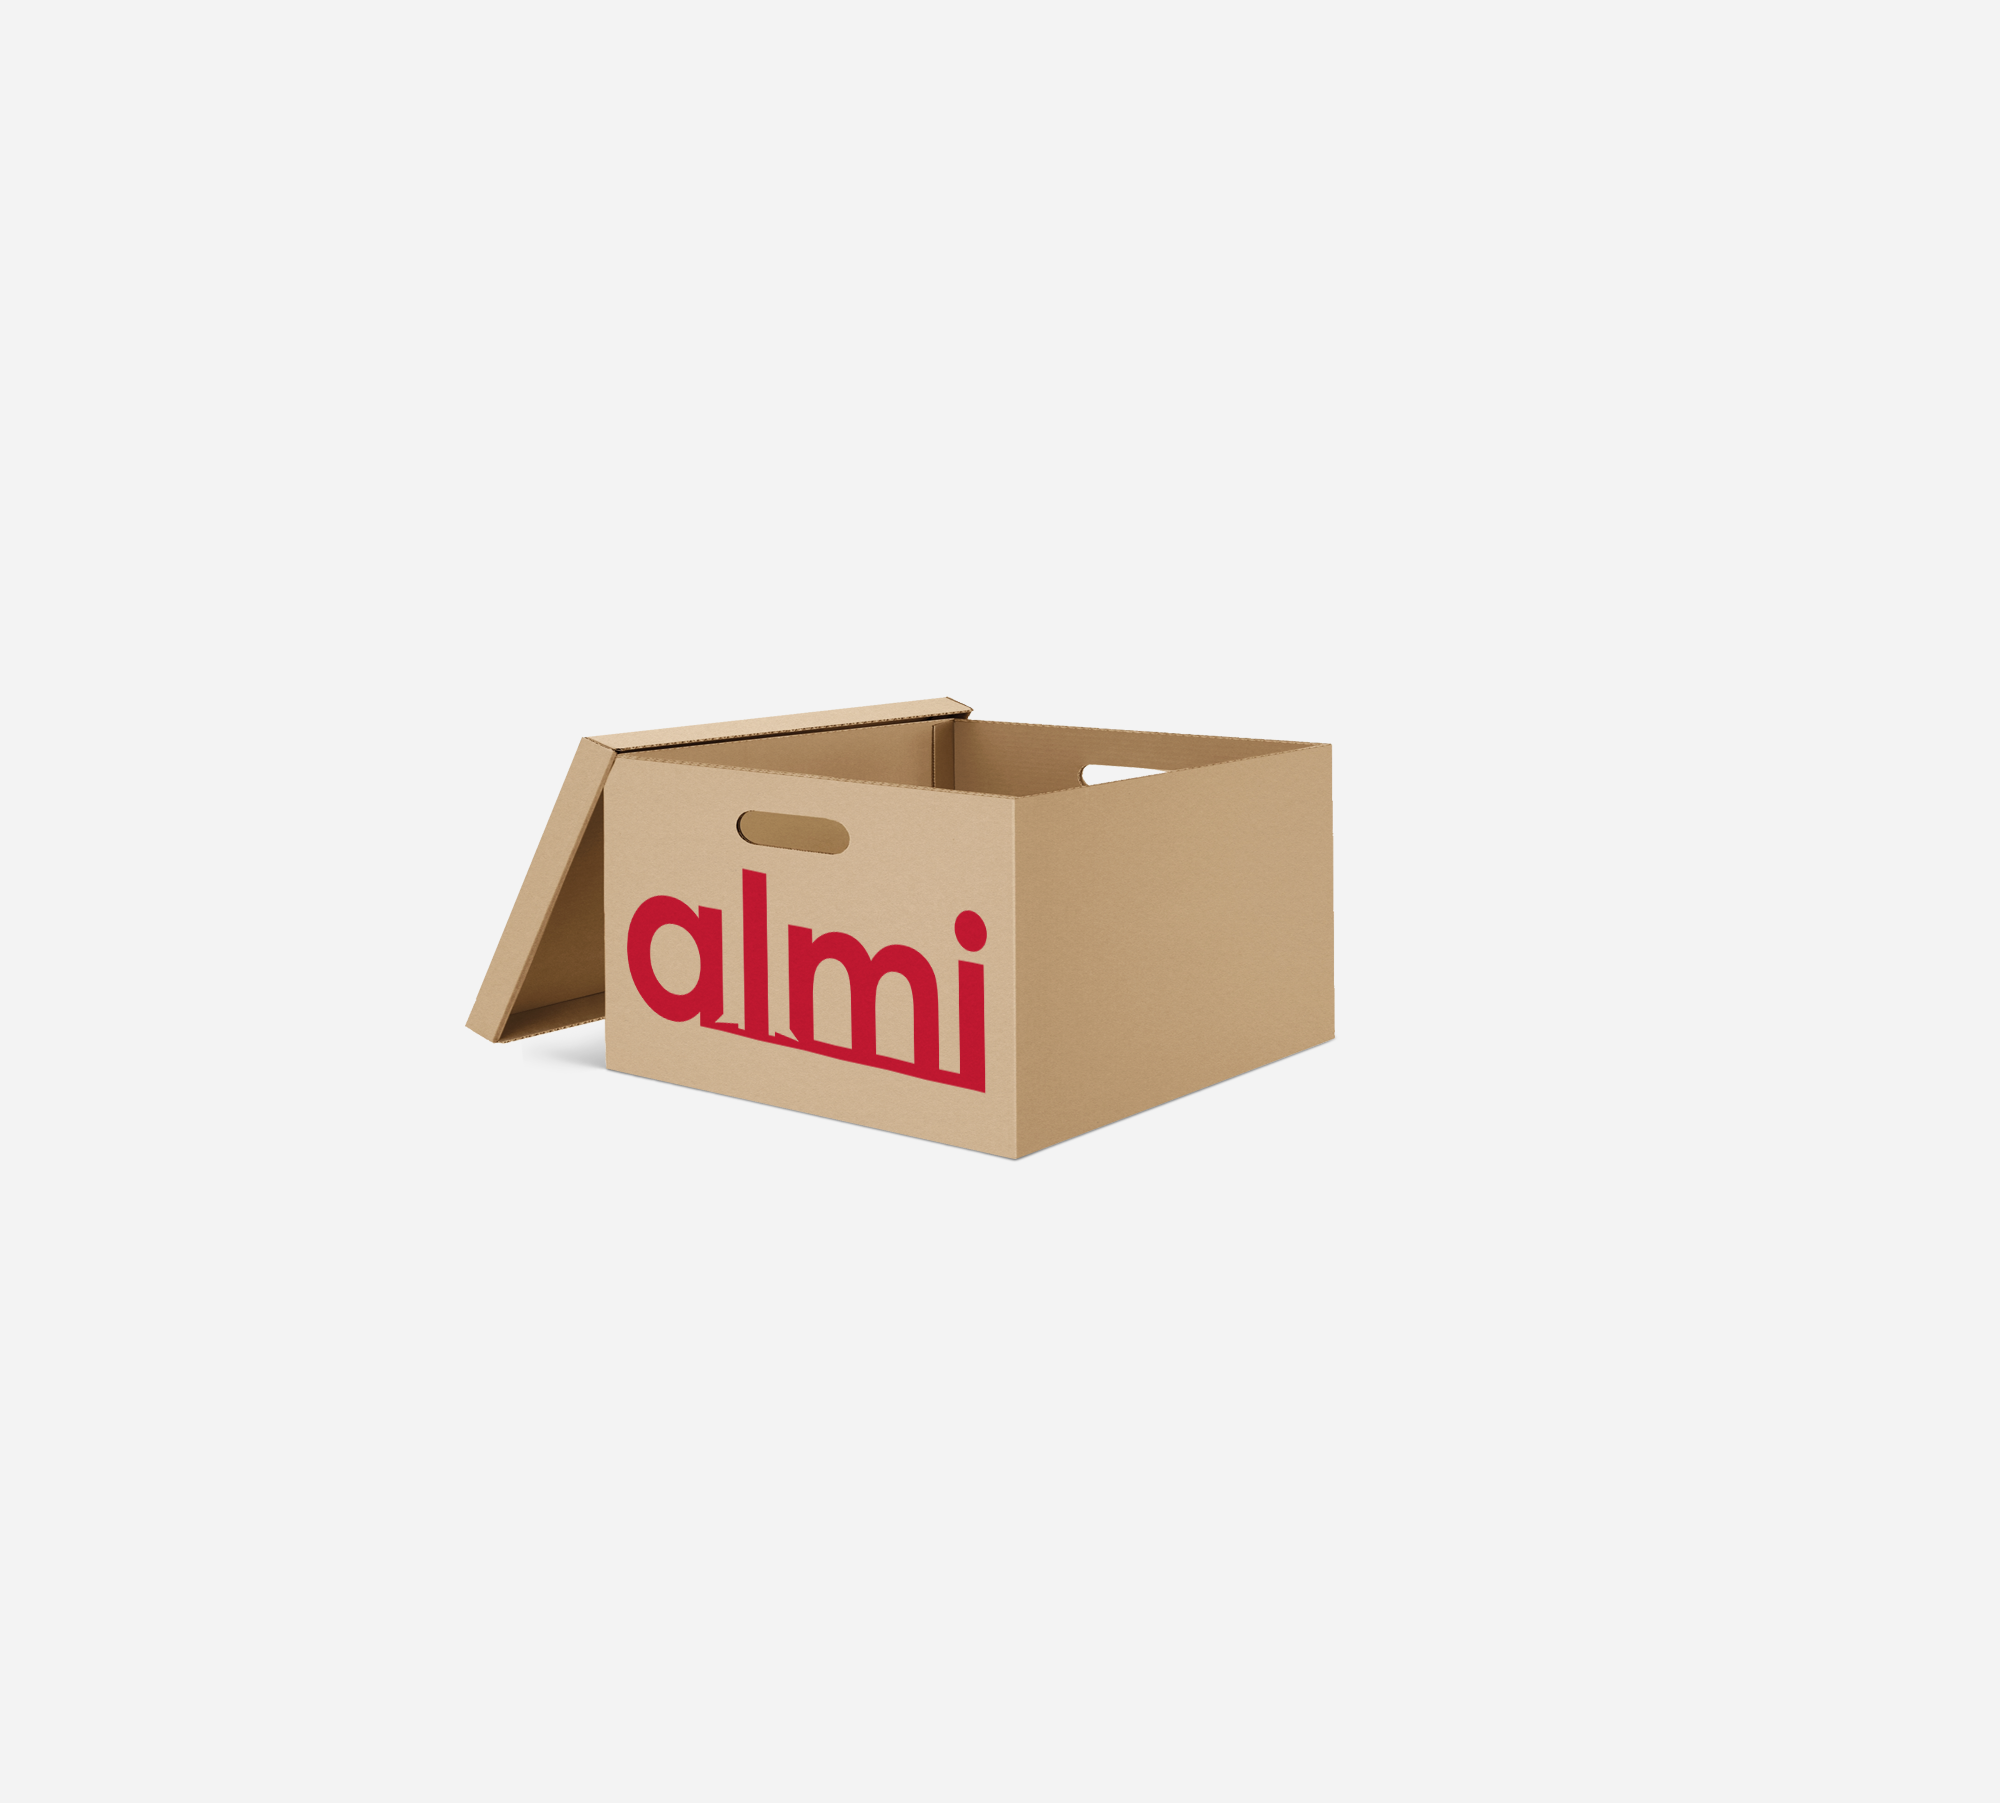 Дизайн логотипа обувной марки Алми фото f_26459e9935cbbc9c.png